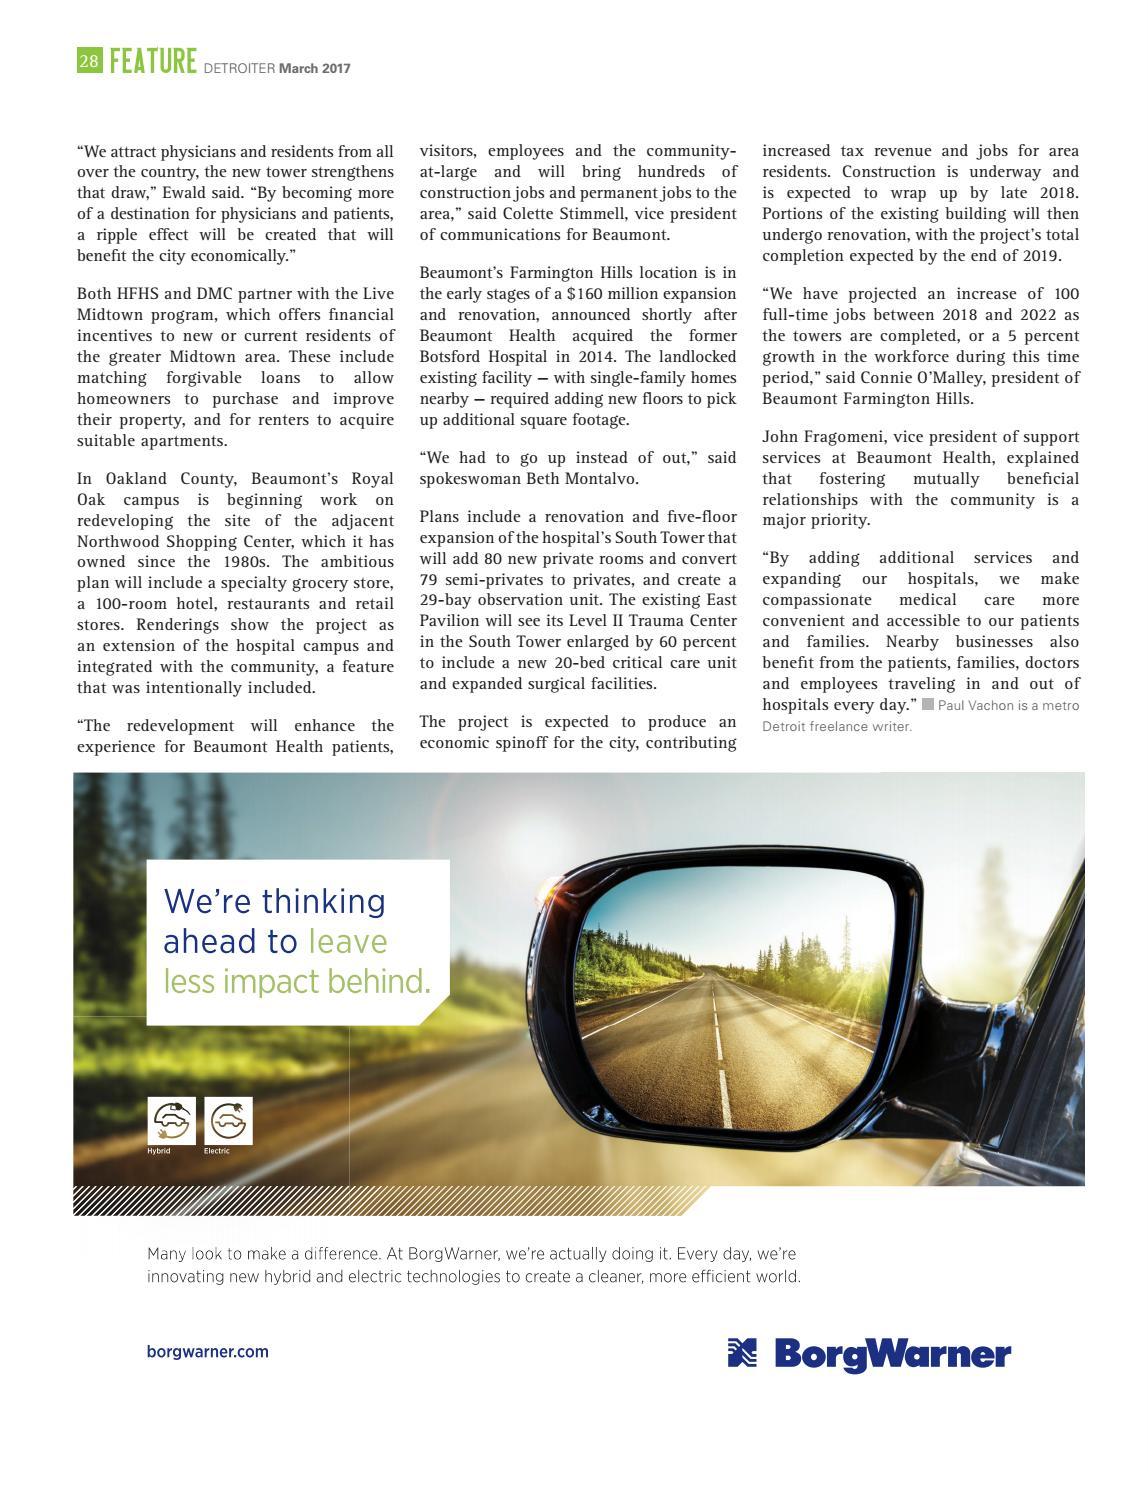 Detroiter Magazine March Issue by Detroit Regional Chamber - issuu